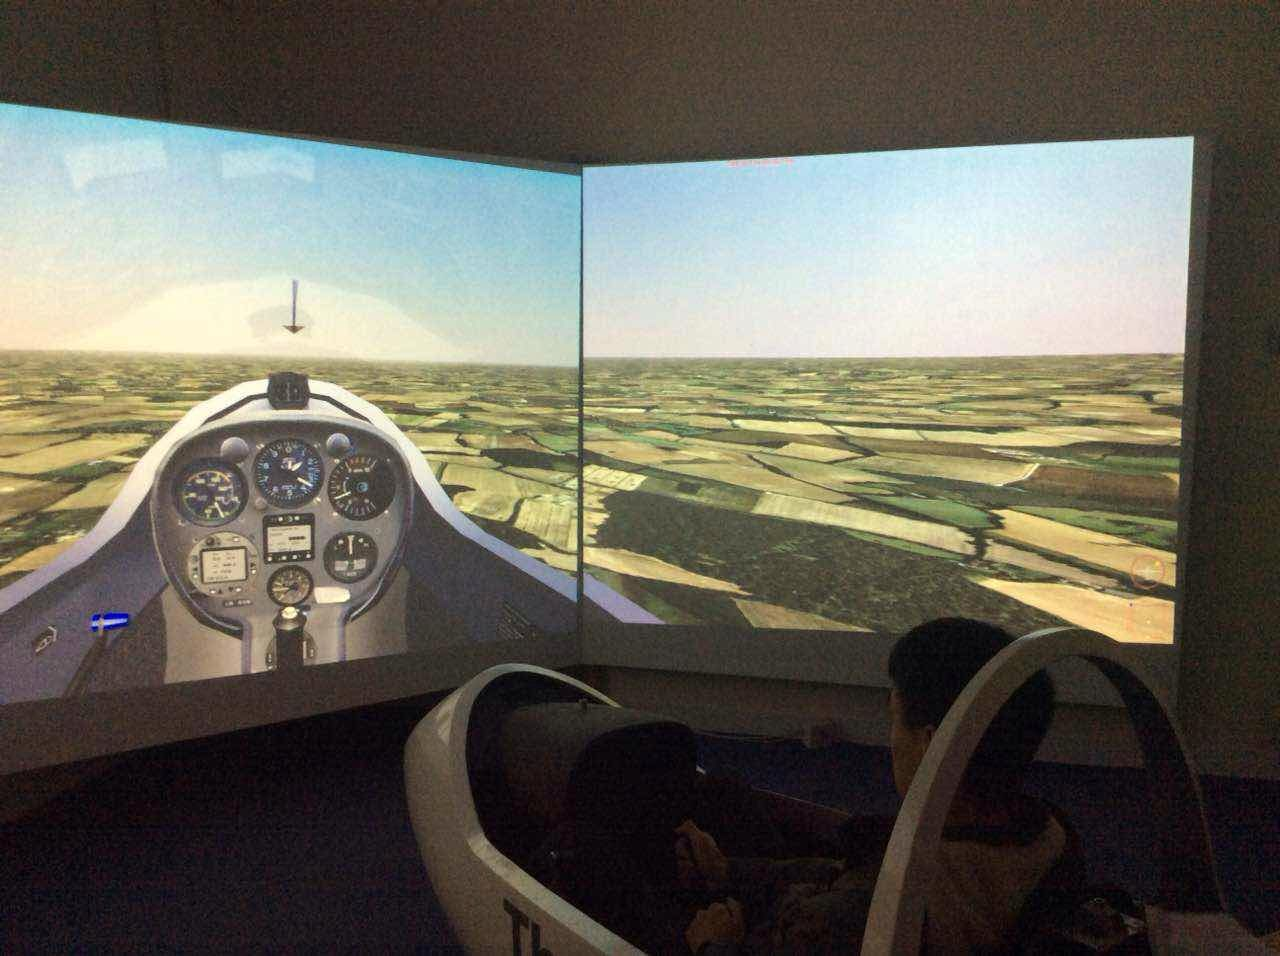 henry-in-simulator